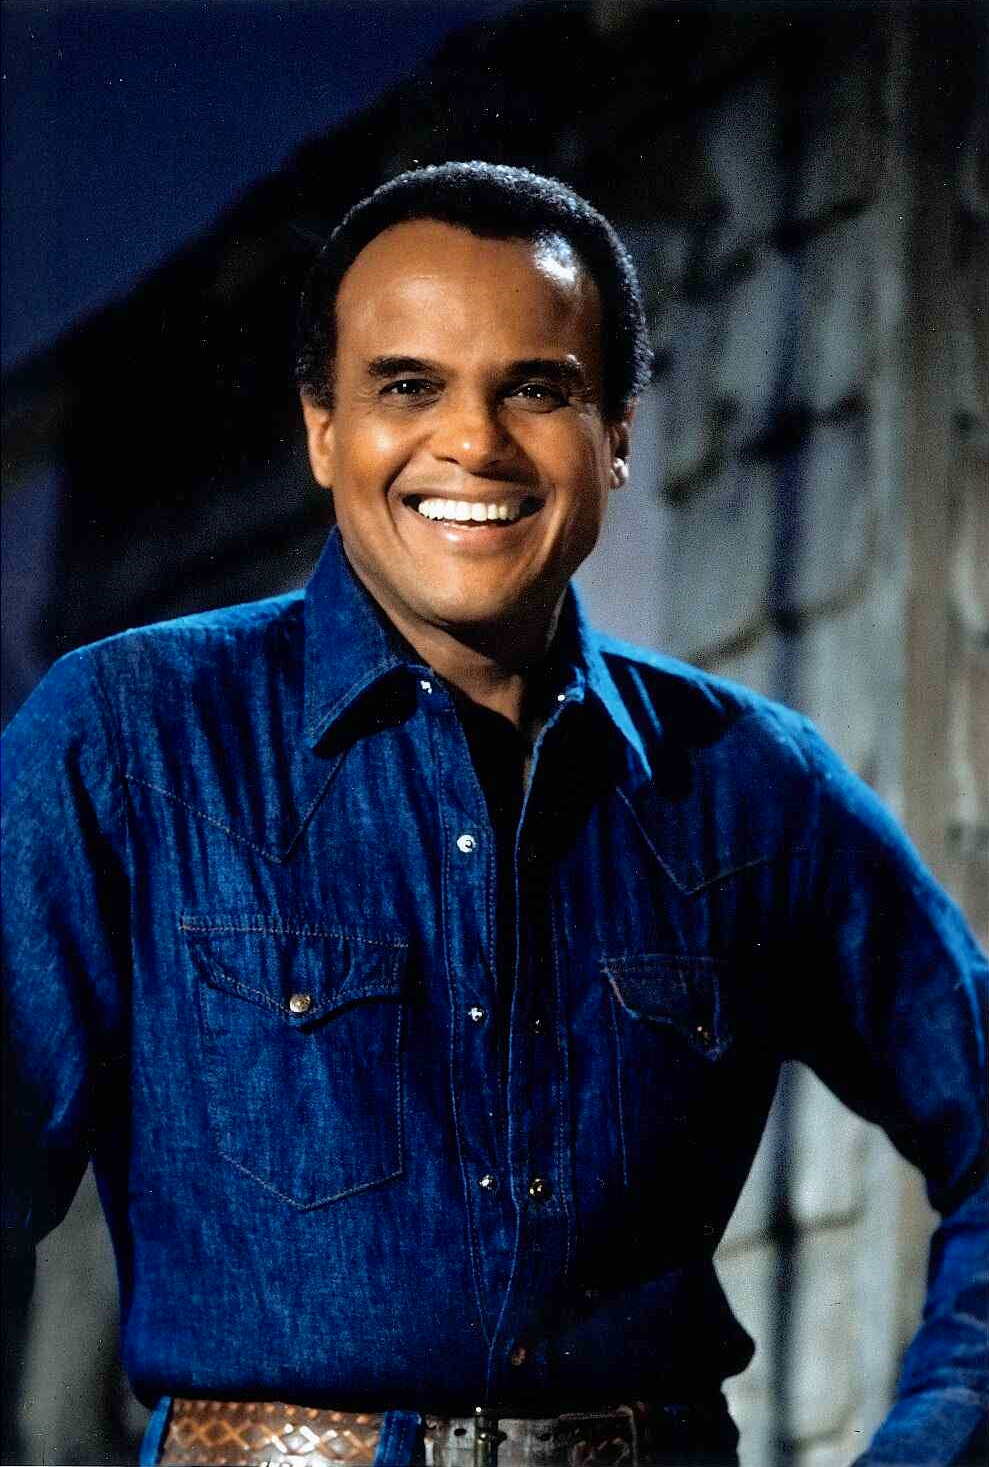 Episode 314: Harry Belafonte